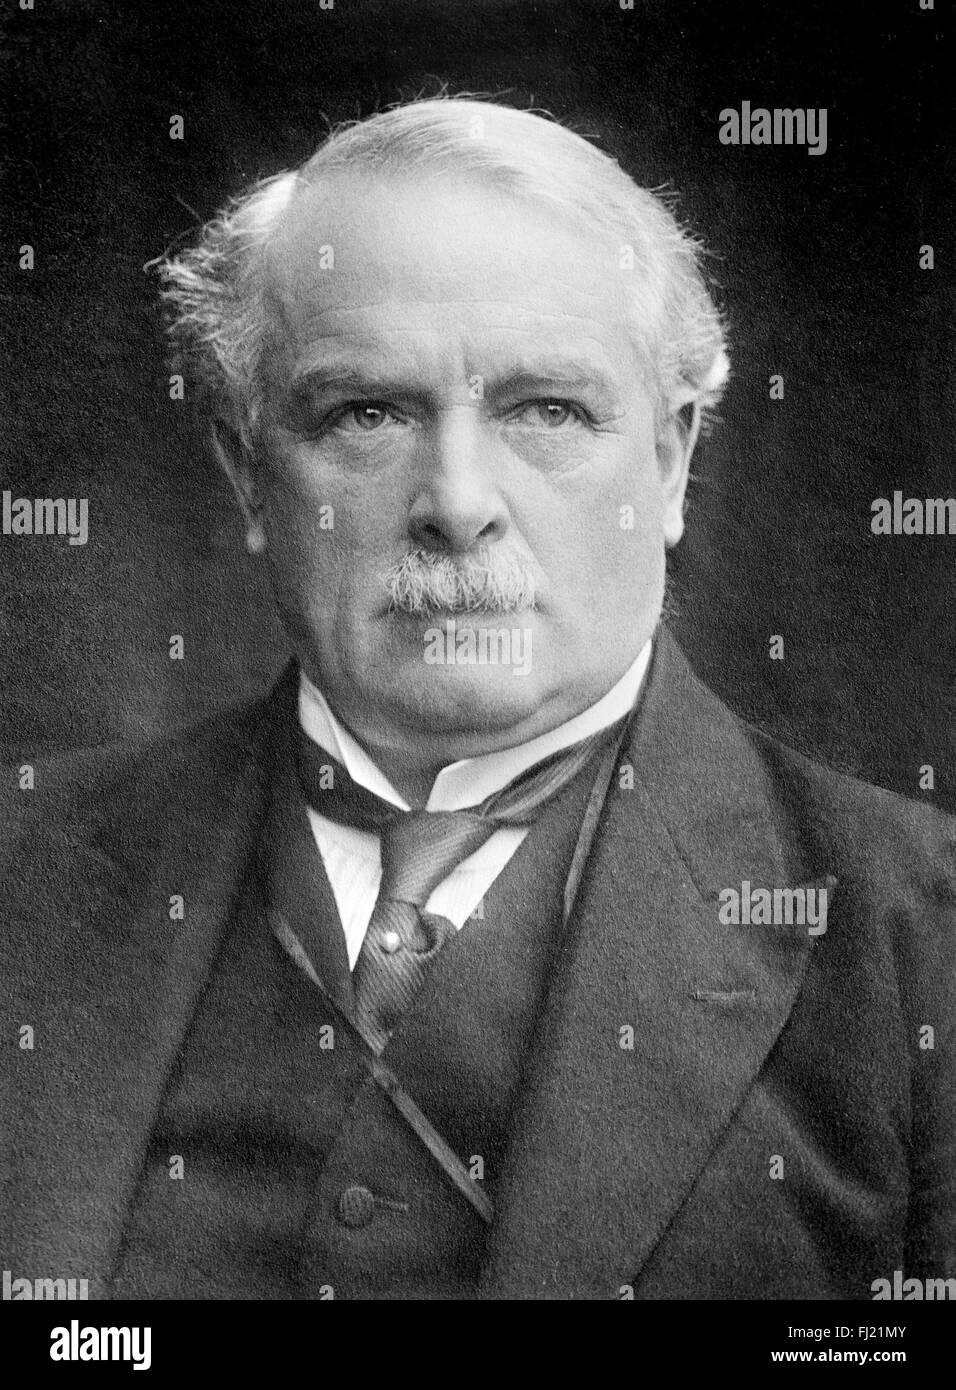 David Lloyd George Immagini Stock